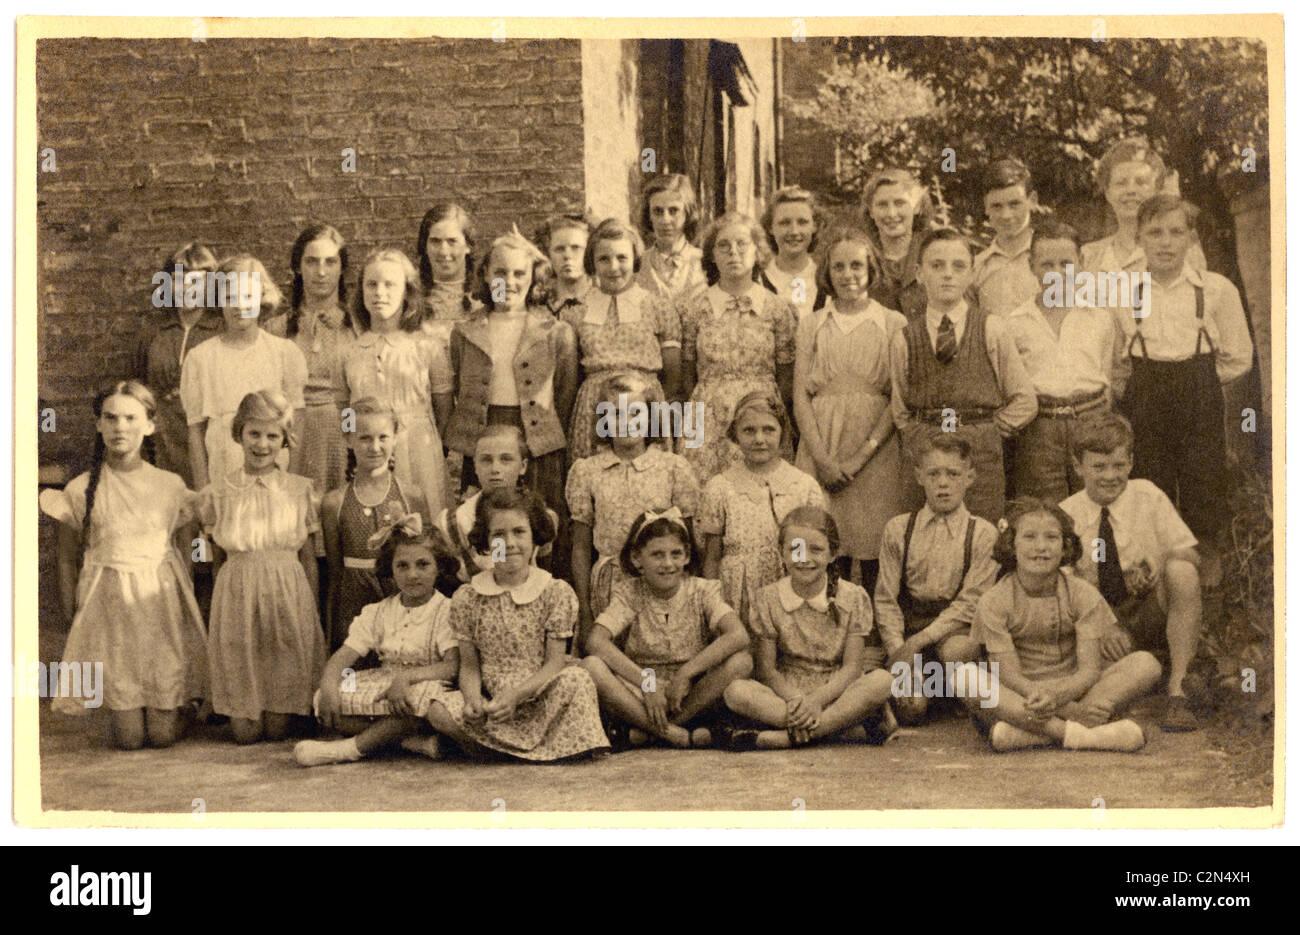 Class photograph of school children (piano class) in 1930's/1940's ,London,U.K. - Stock Image